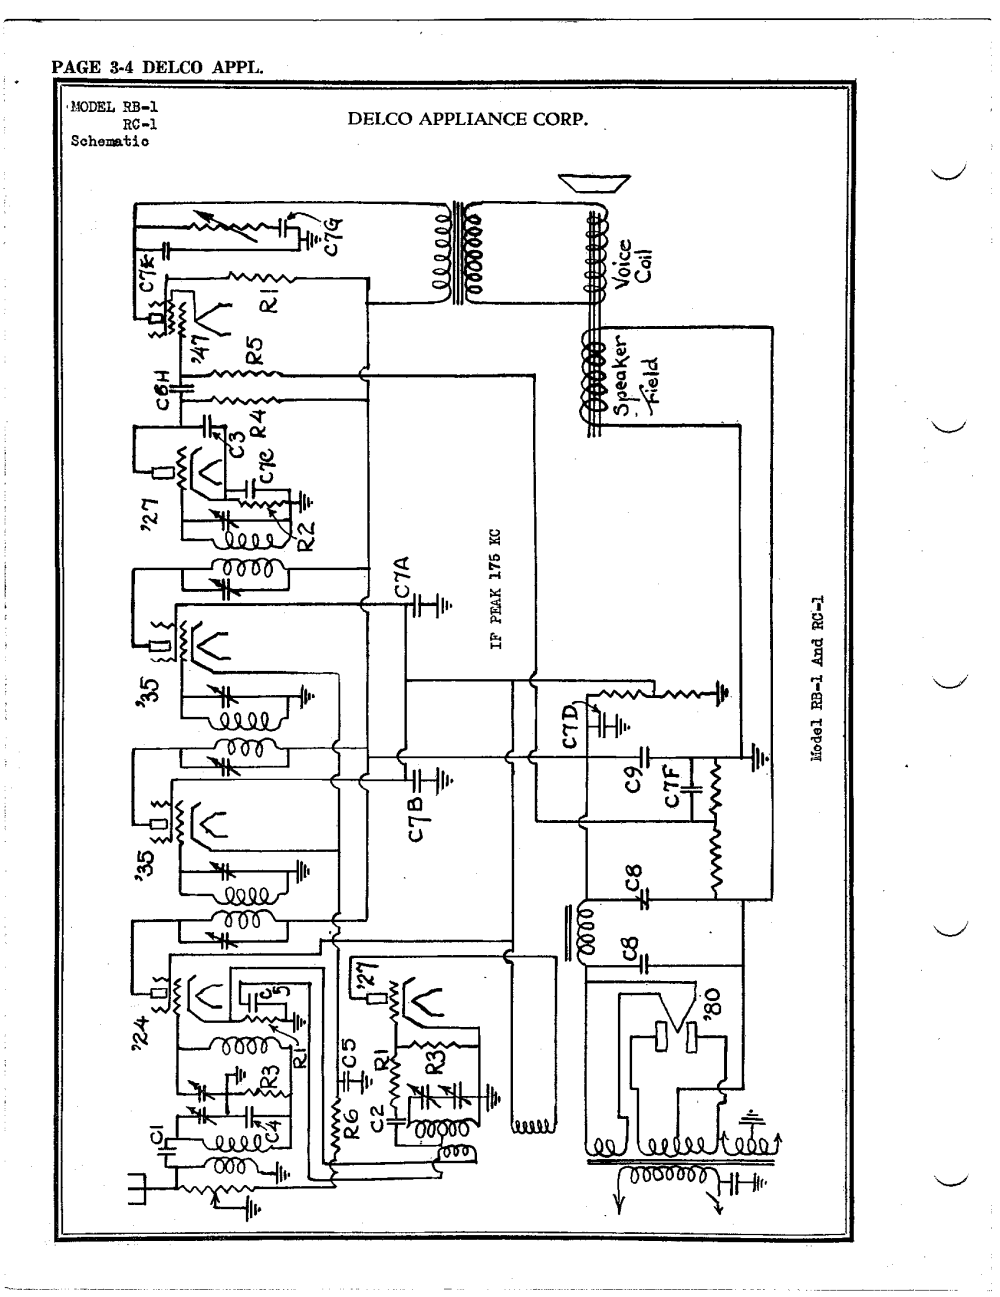 medium resolution of delco radio schematics wiring diagram show delco radio schematics wiring diagrams delphi delco radio schematics delco